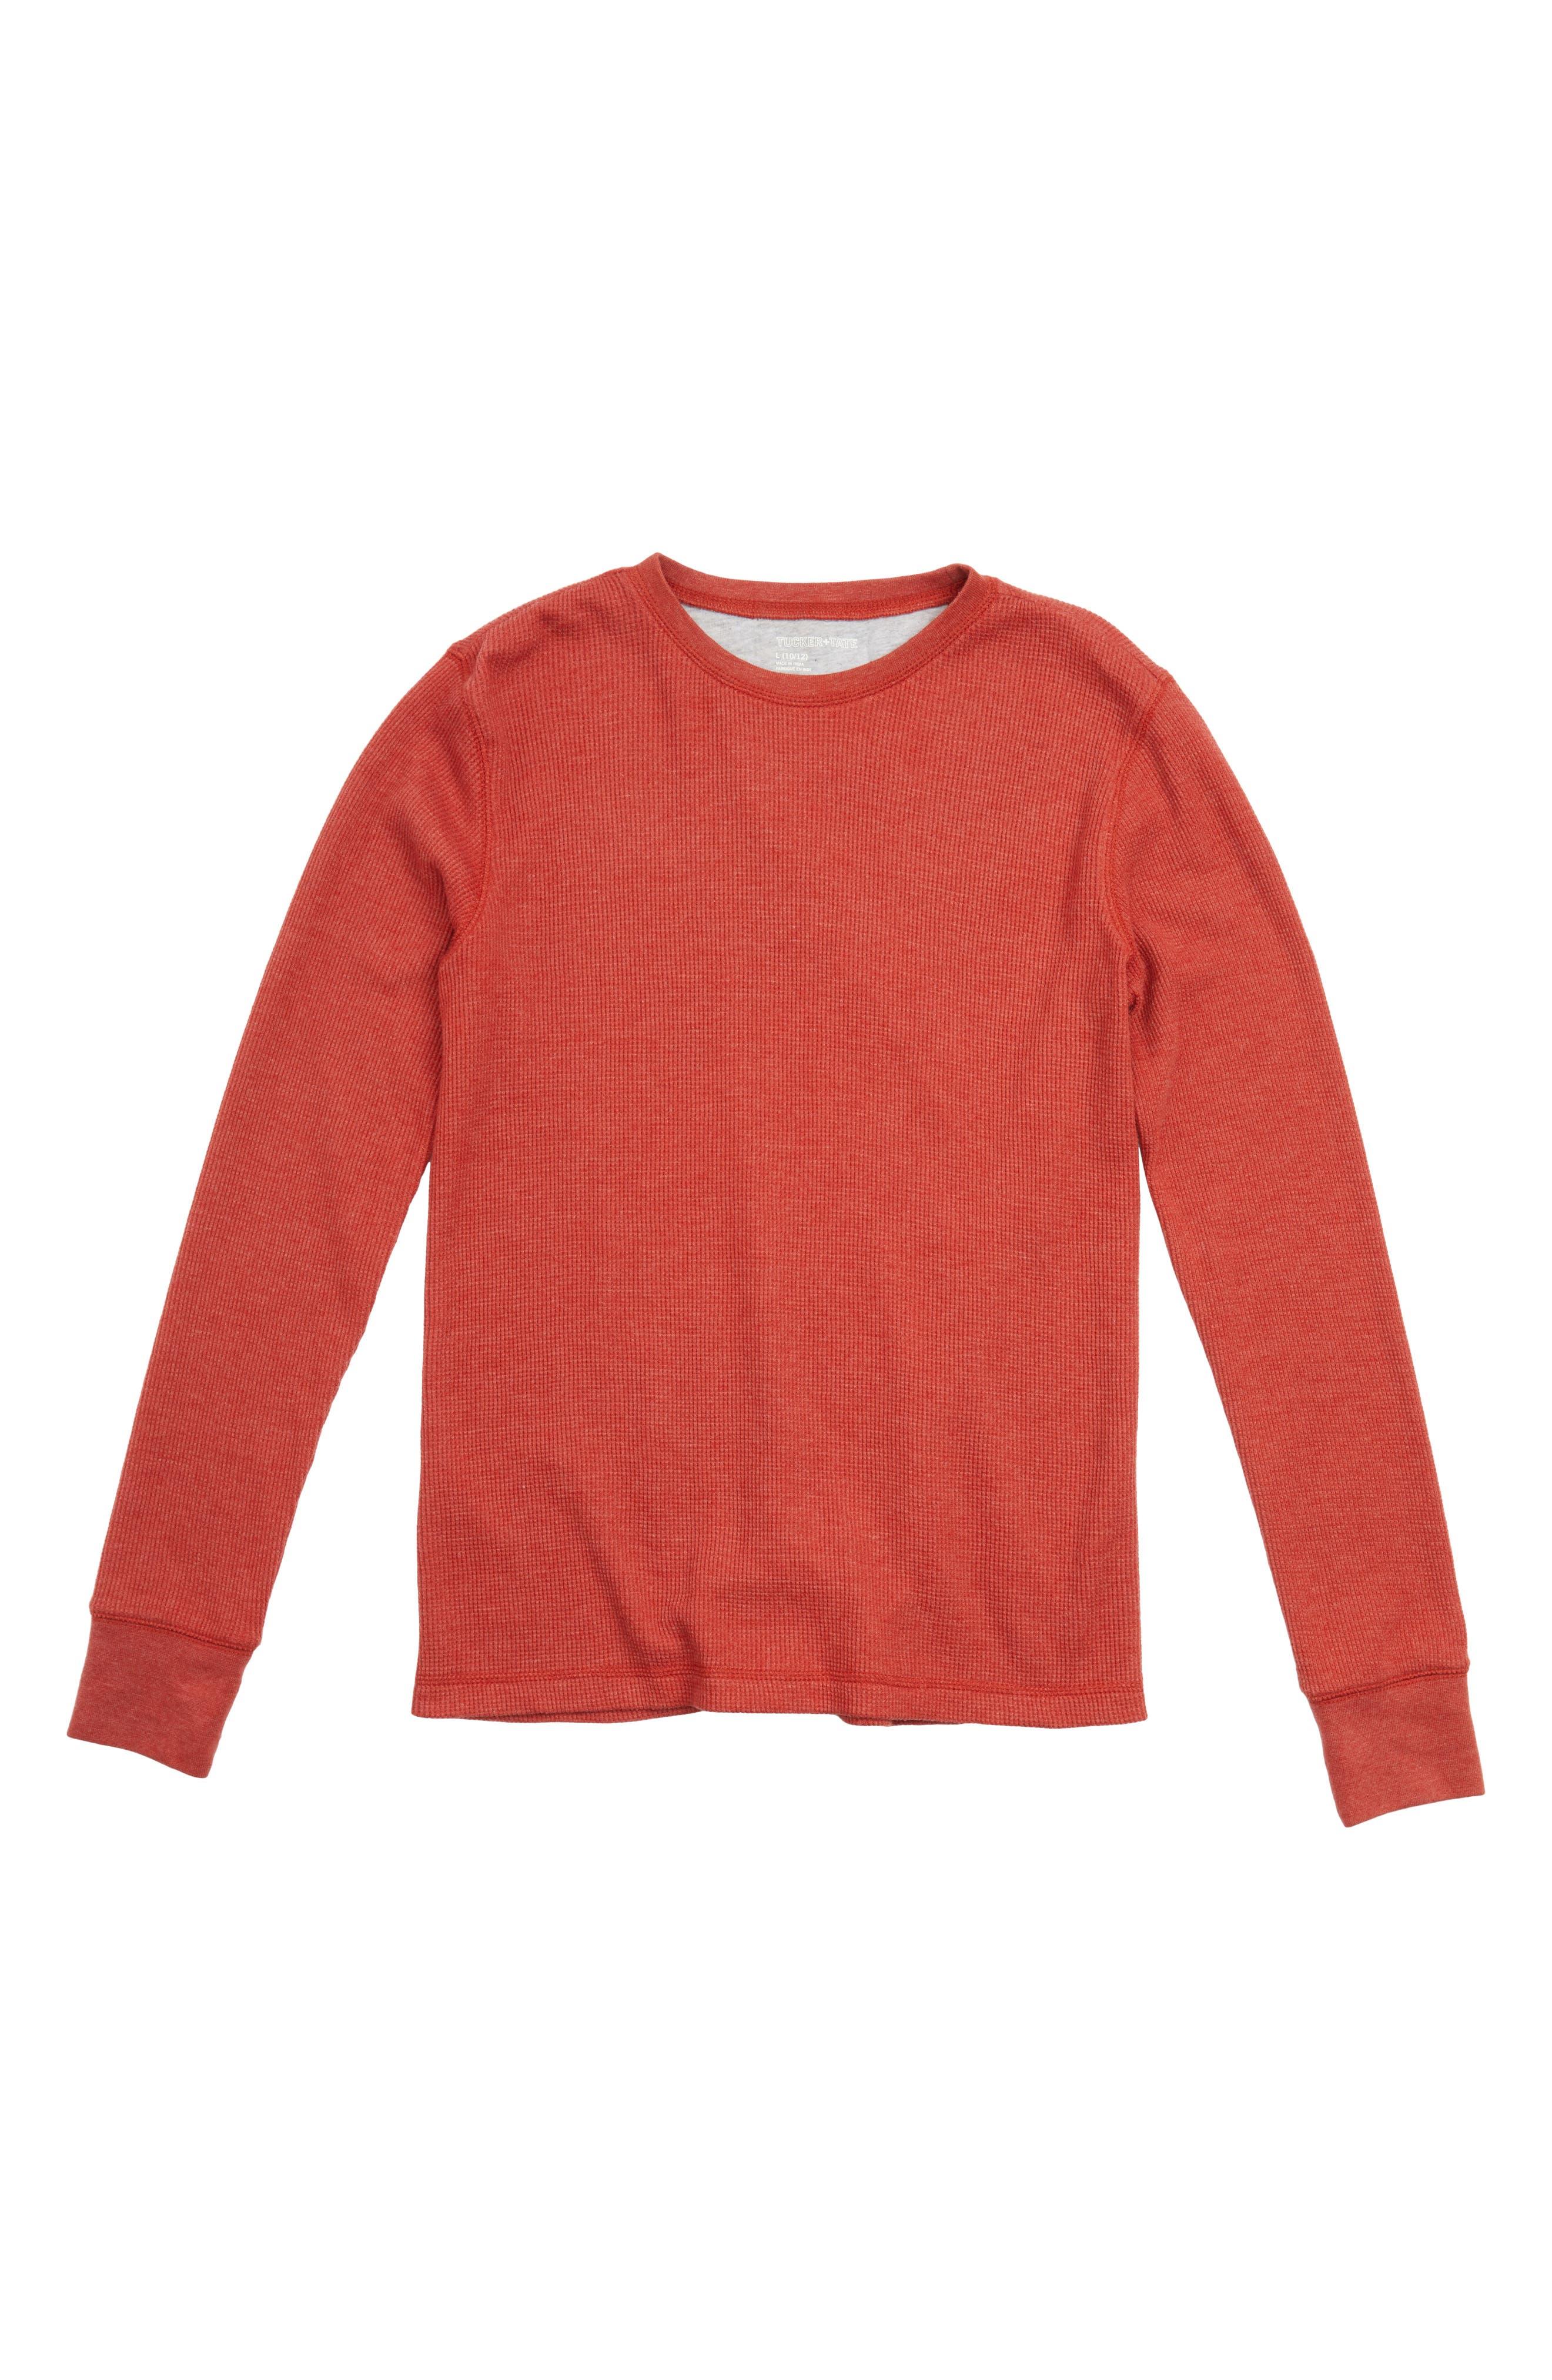 Alternate Image 1 Selected - Tucker + Tate Long Sleeve Thermal T-Shirt (Big Boys)